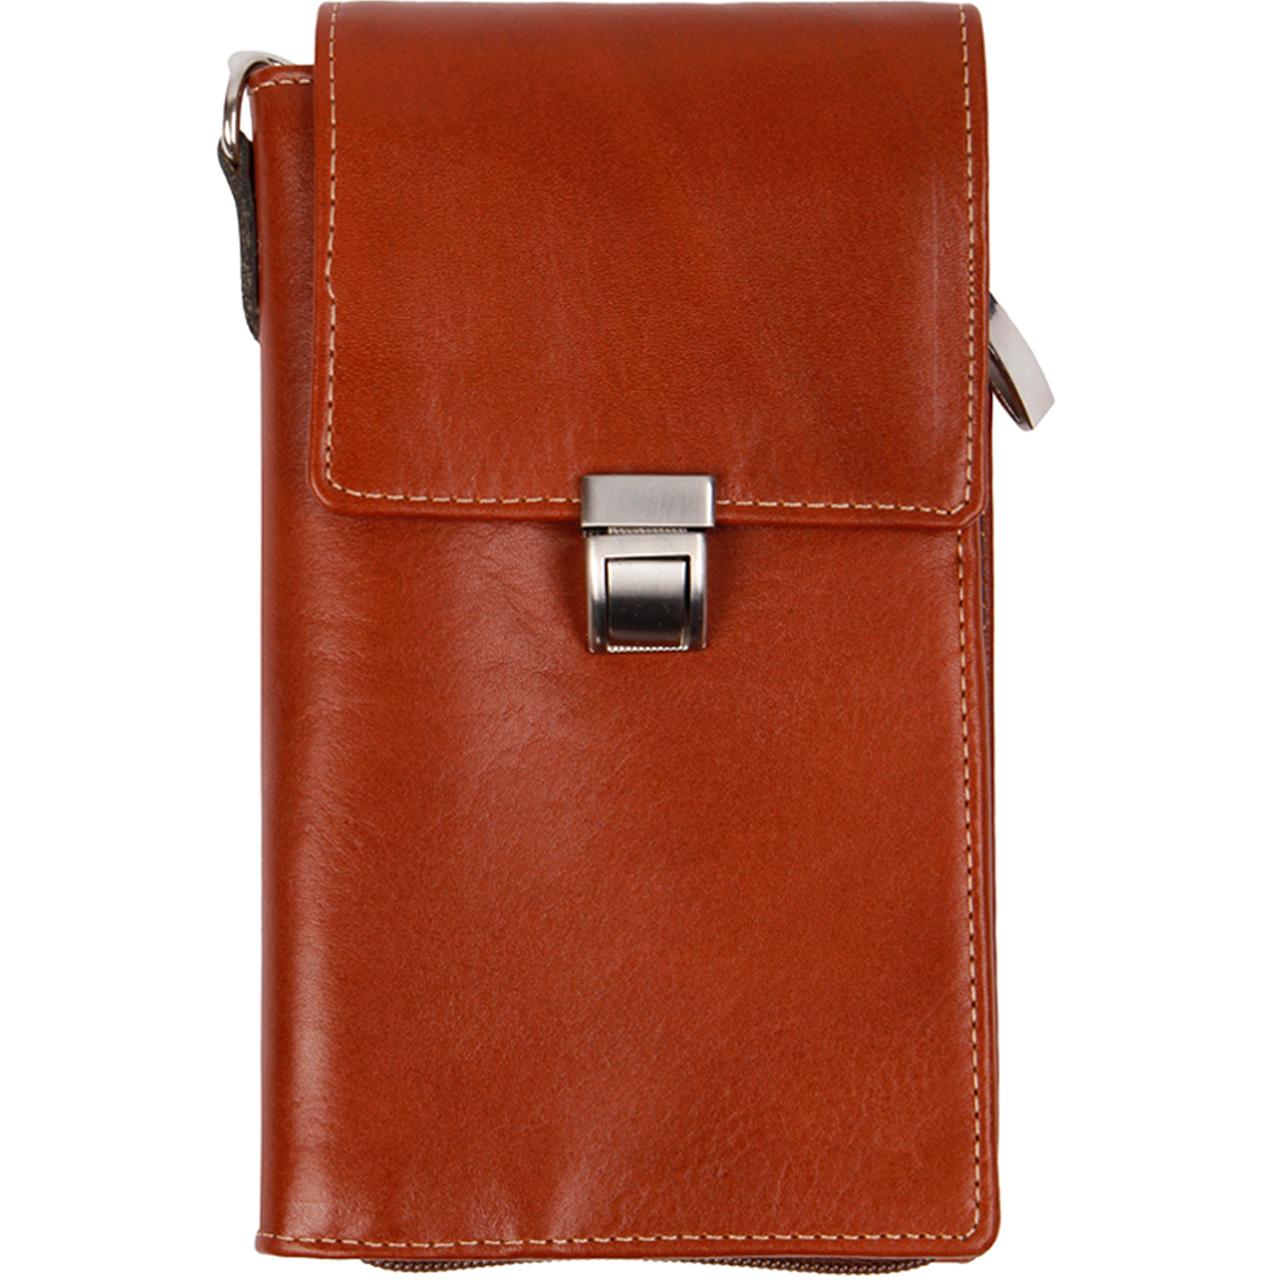 کیف پاسپورتی رویال چرم کد P3/1-Brown